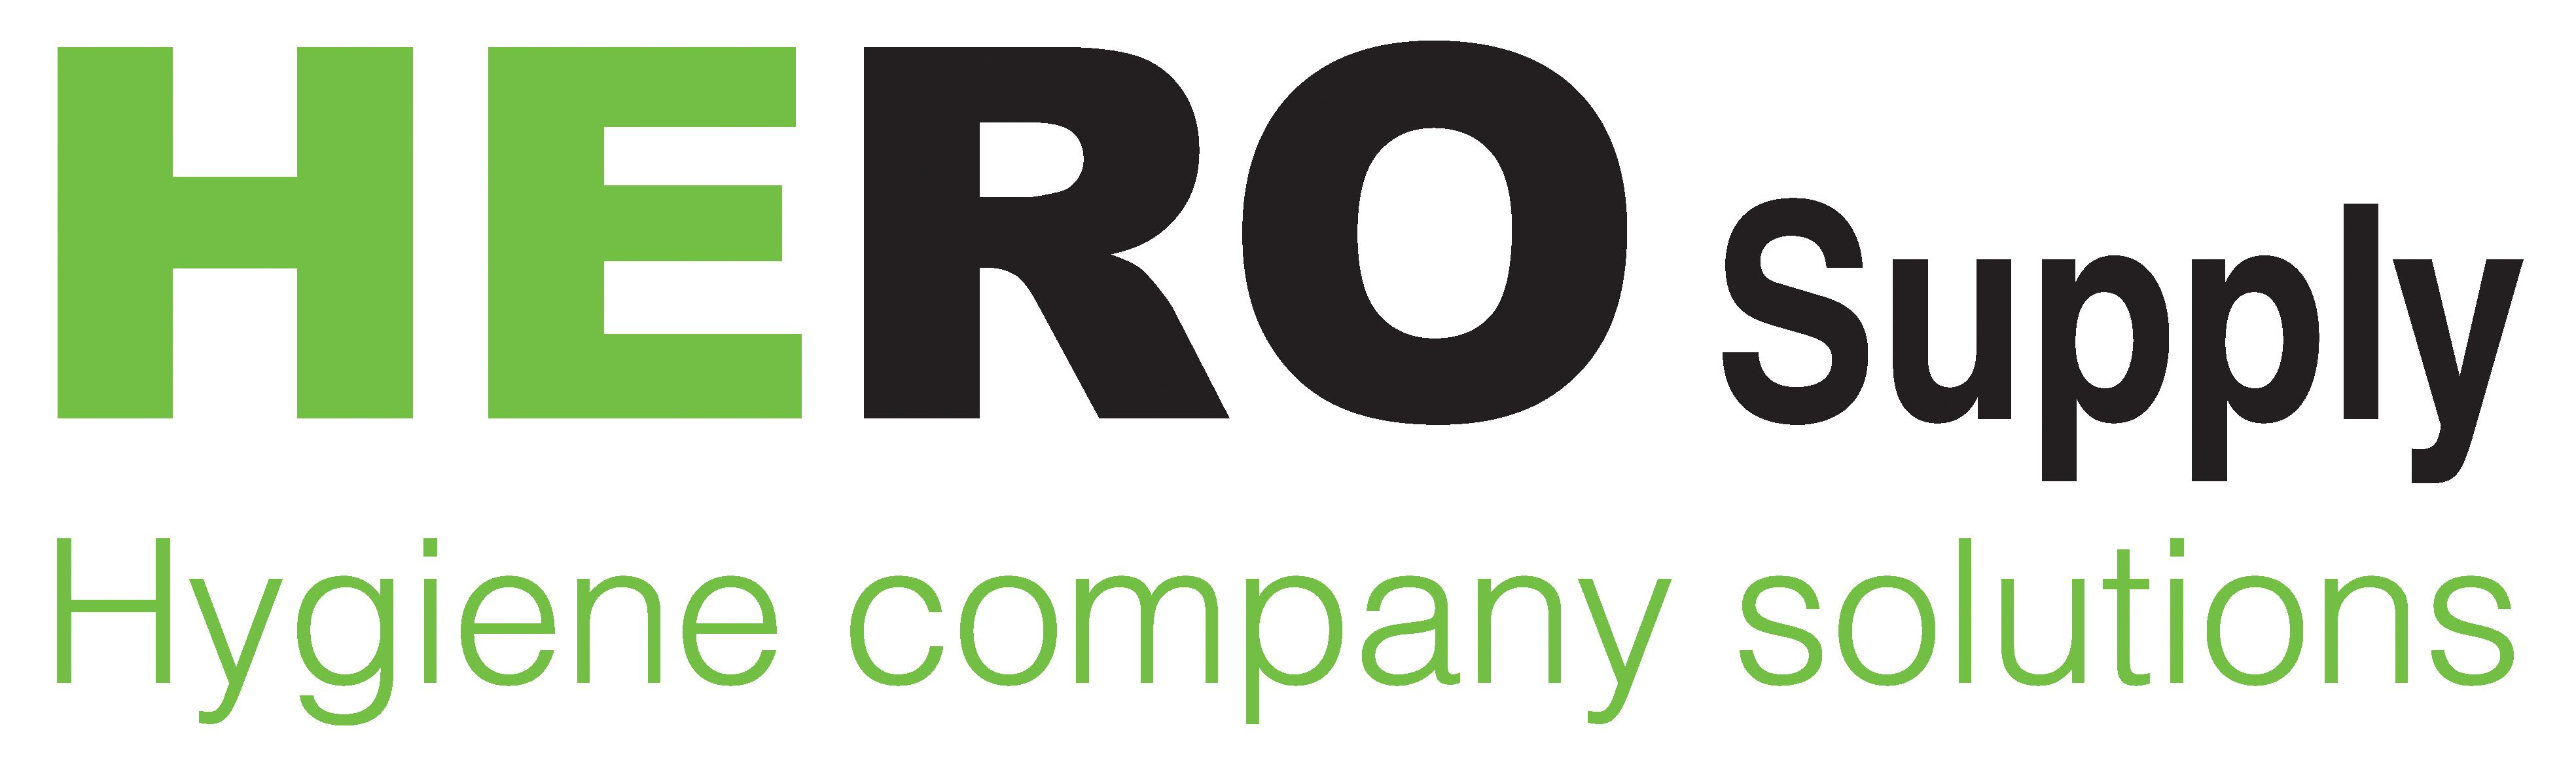 Hero Supply logo